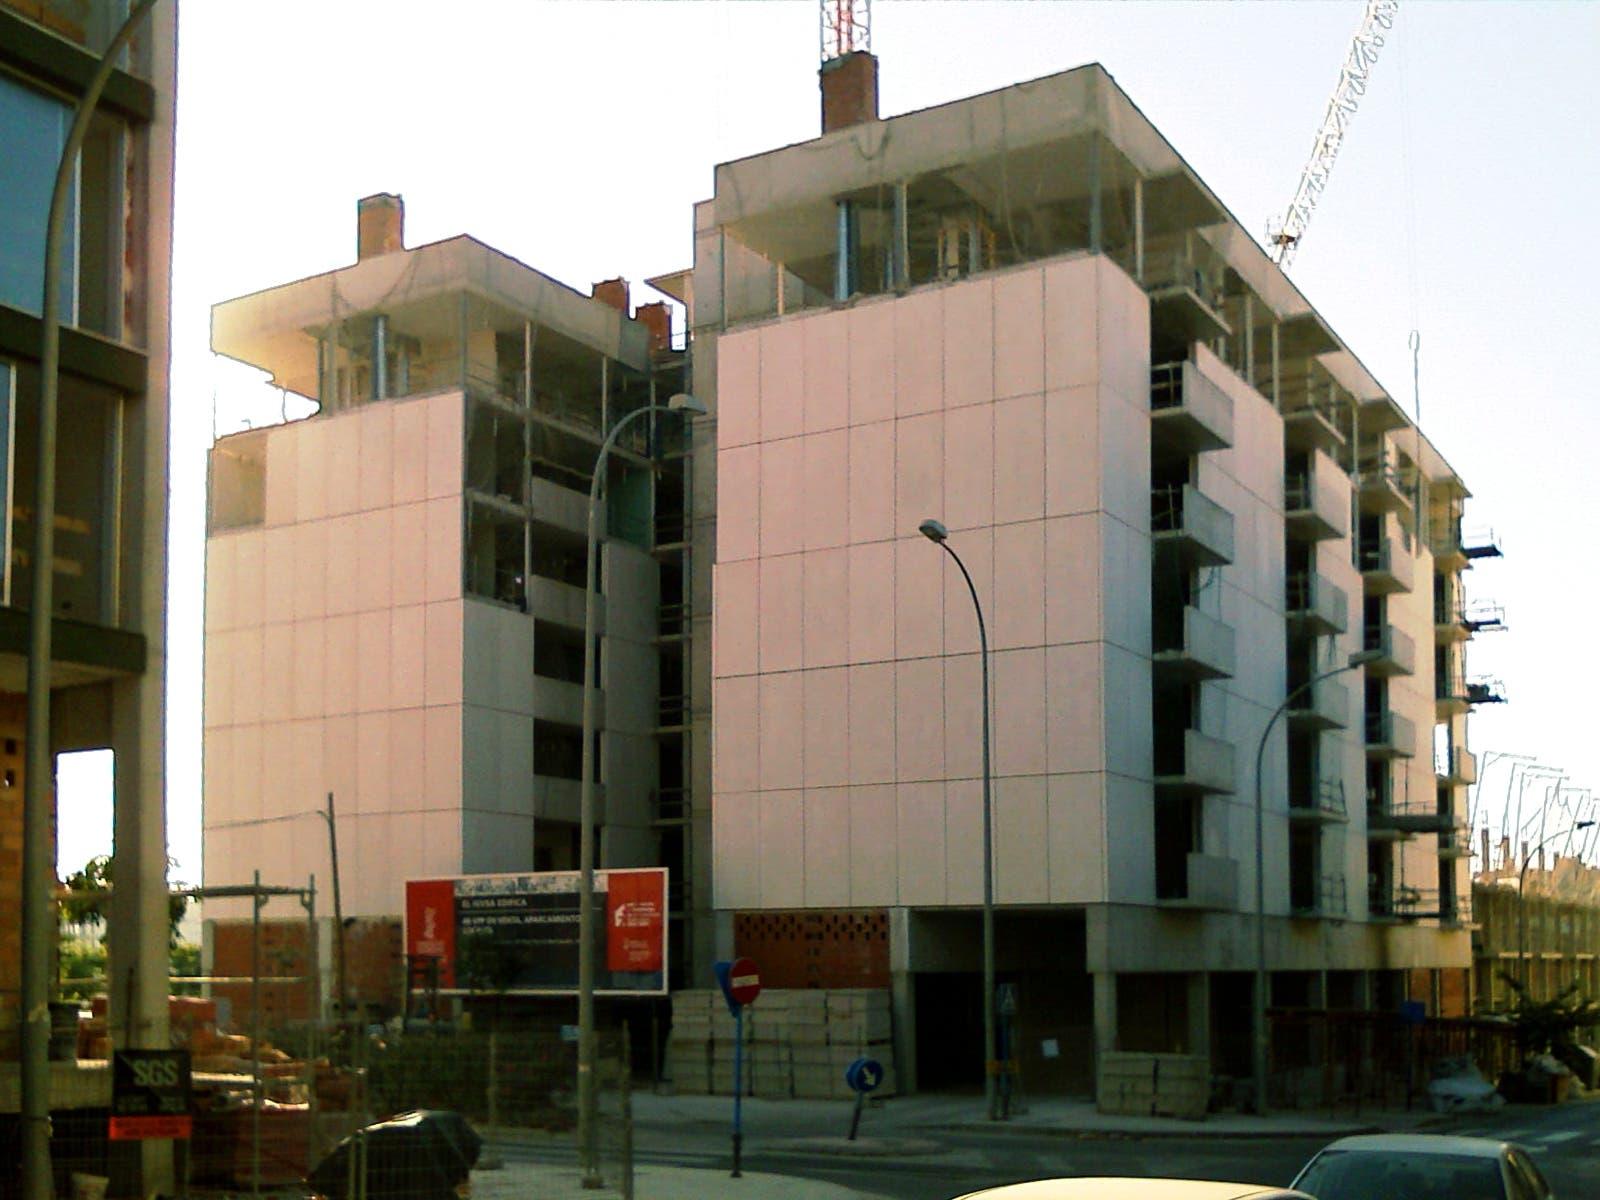 Vpp Council Housing